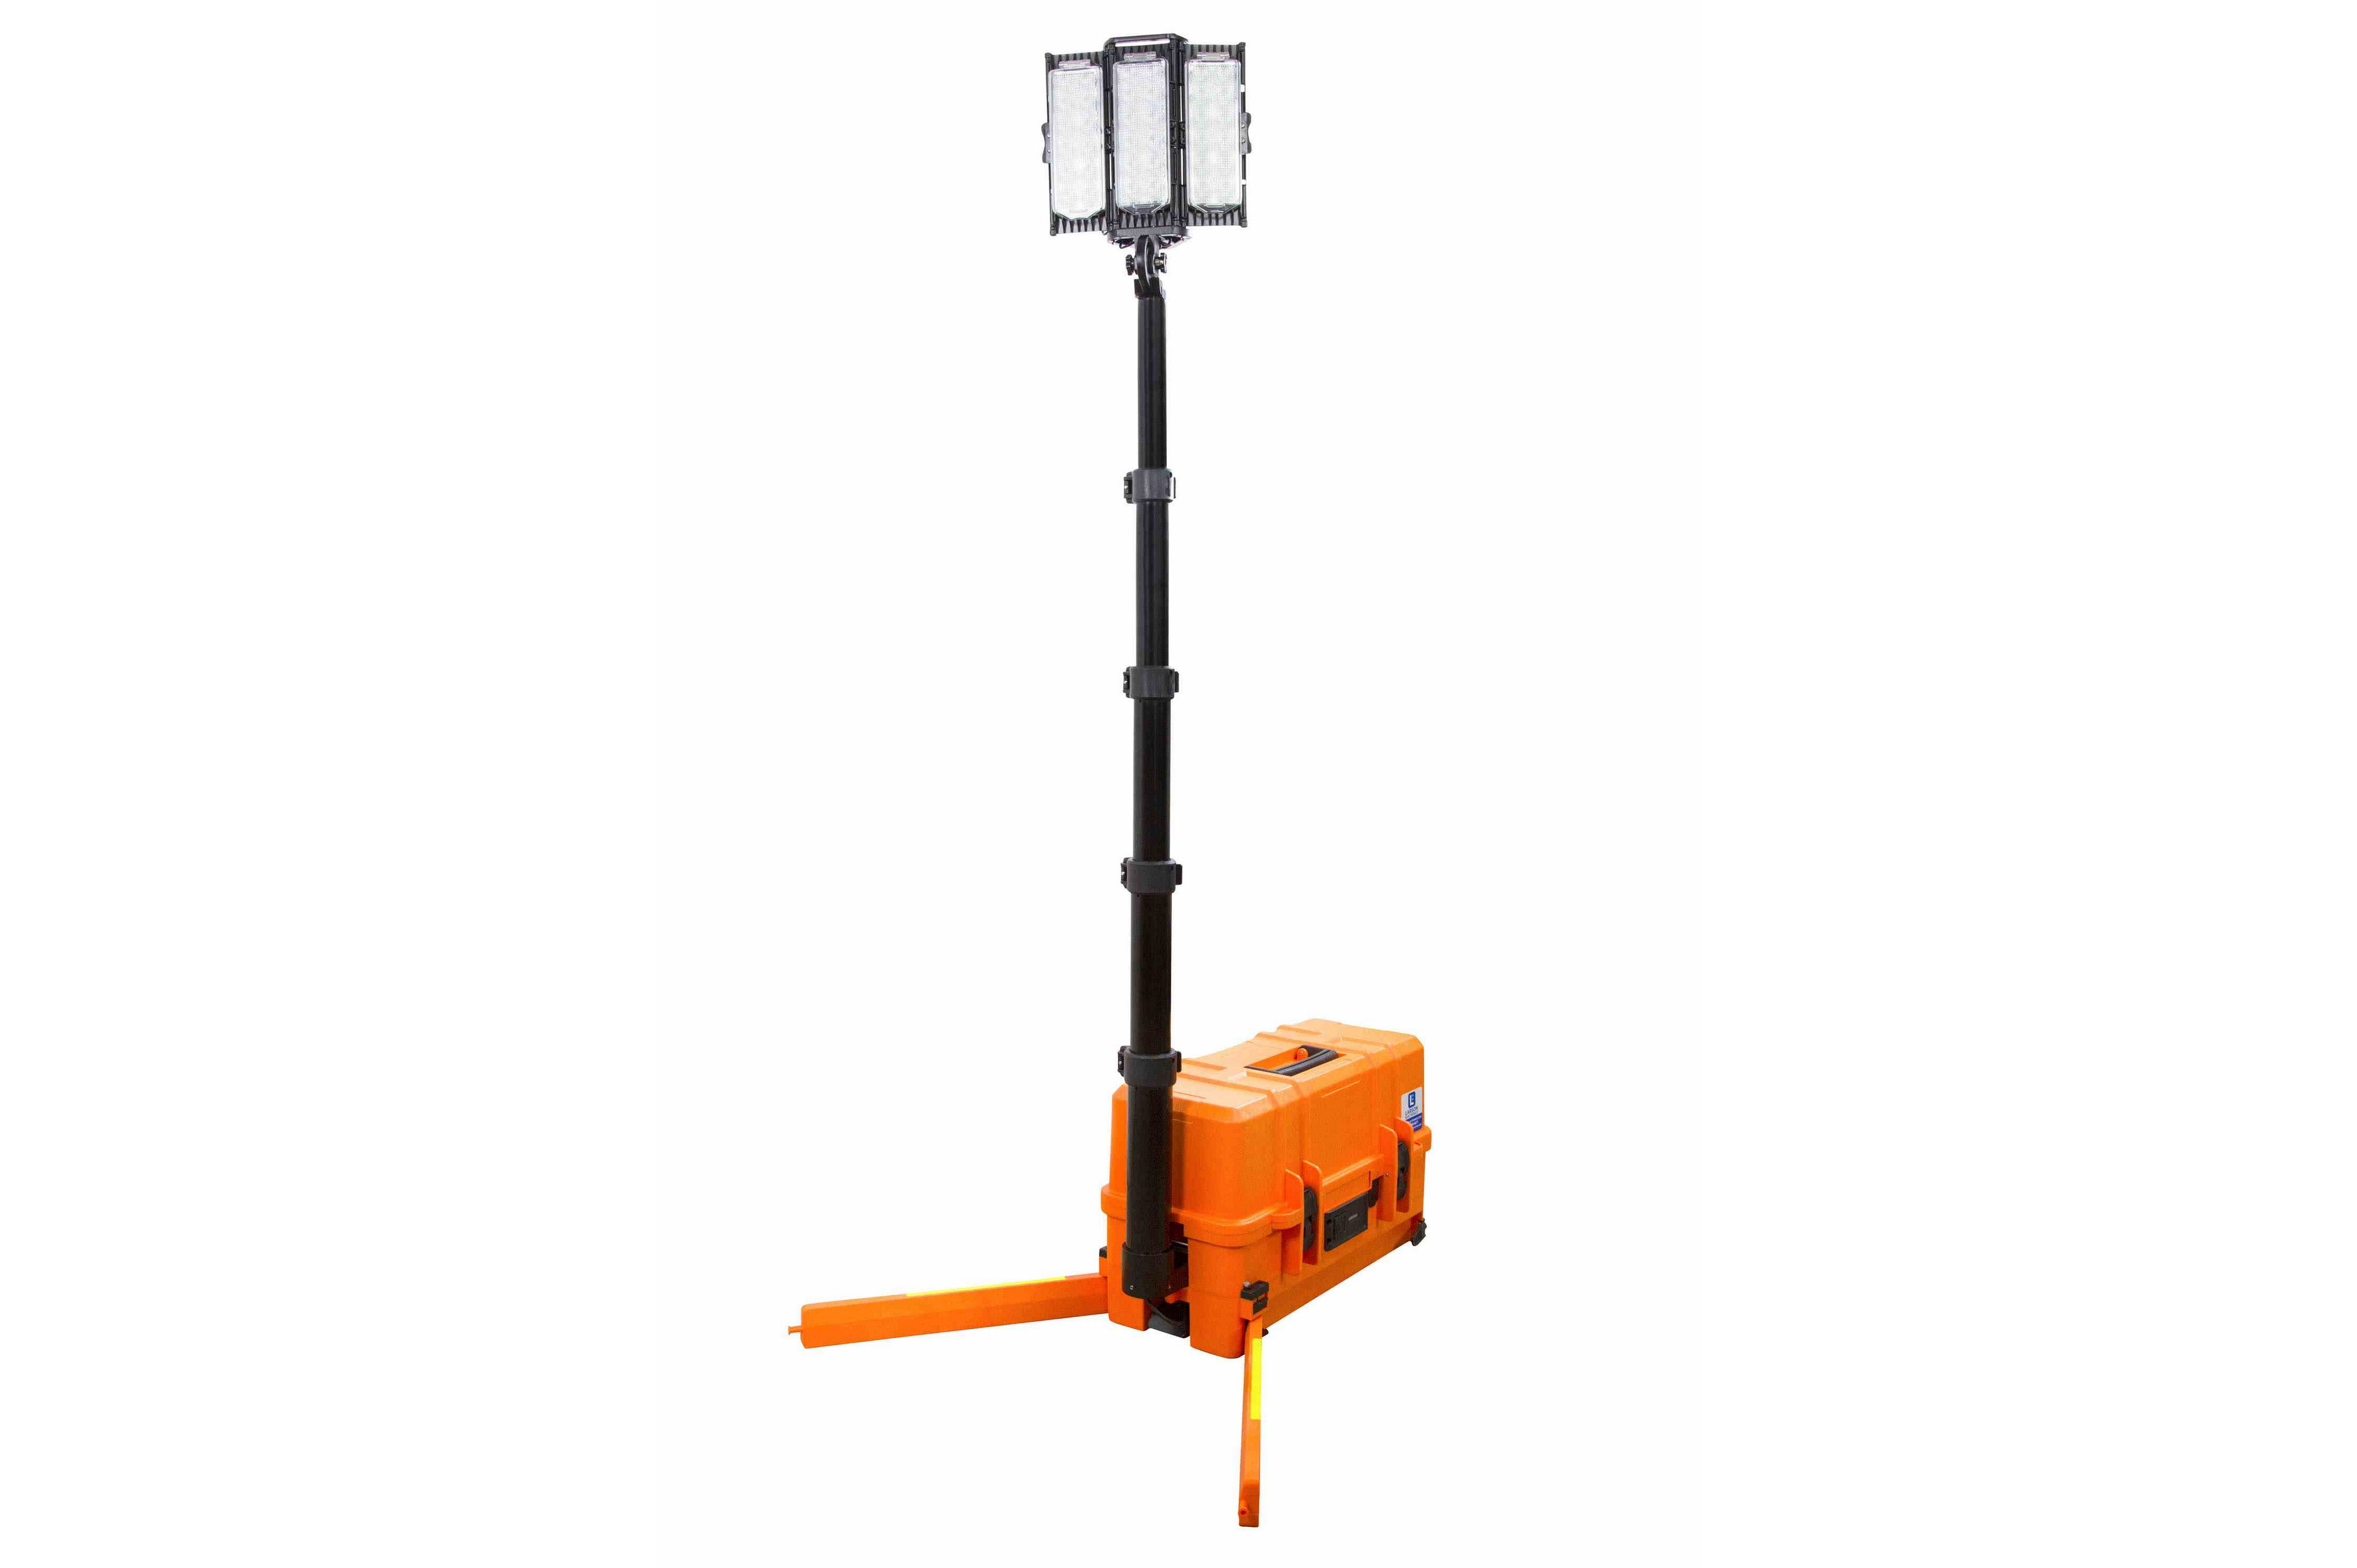 108w Portable Emergency Led Light Tower